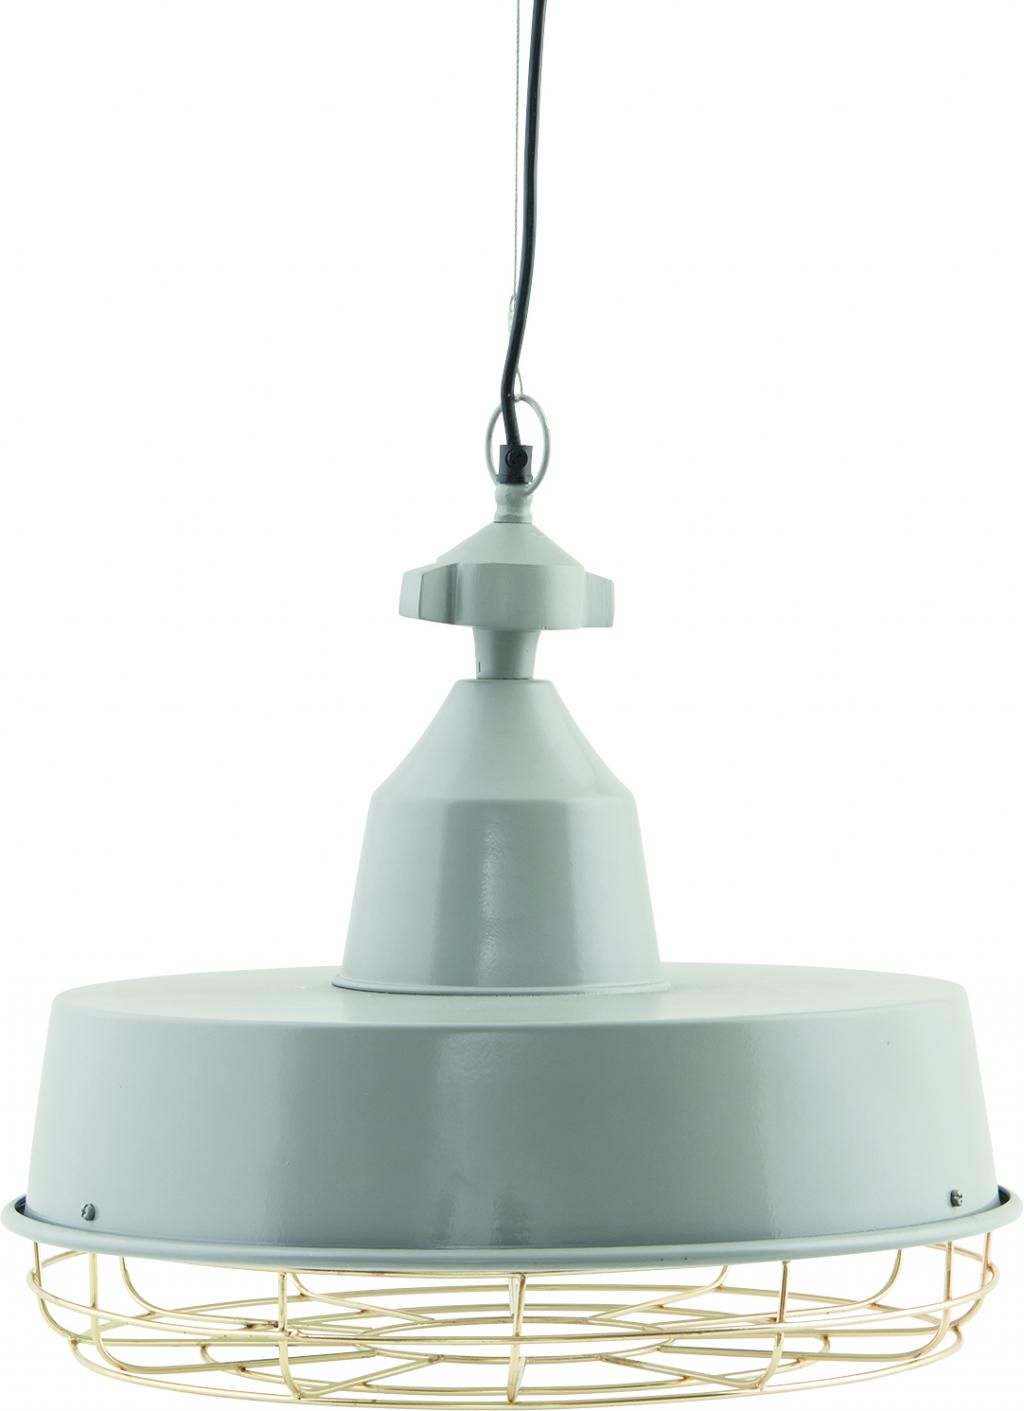 Hanglamp gasby grijs house doctor for House doctor molecular hanglamp